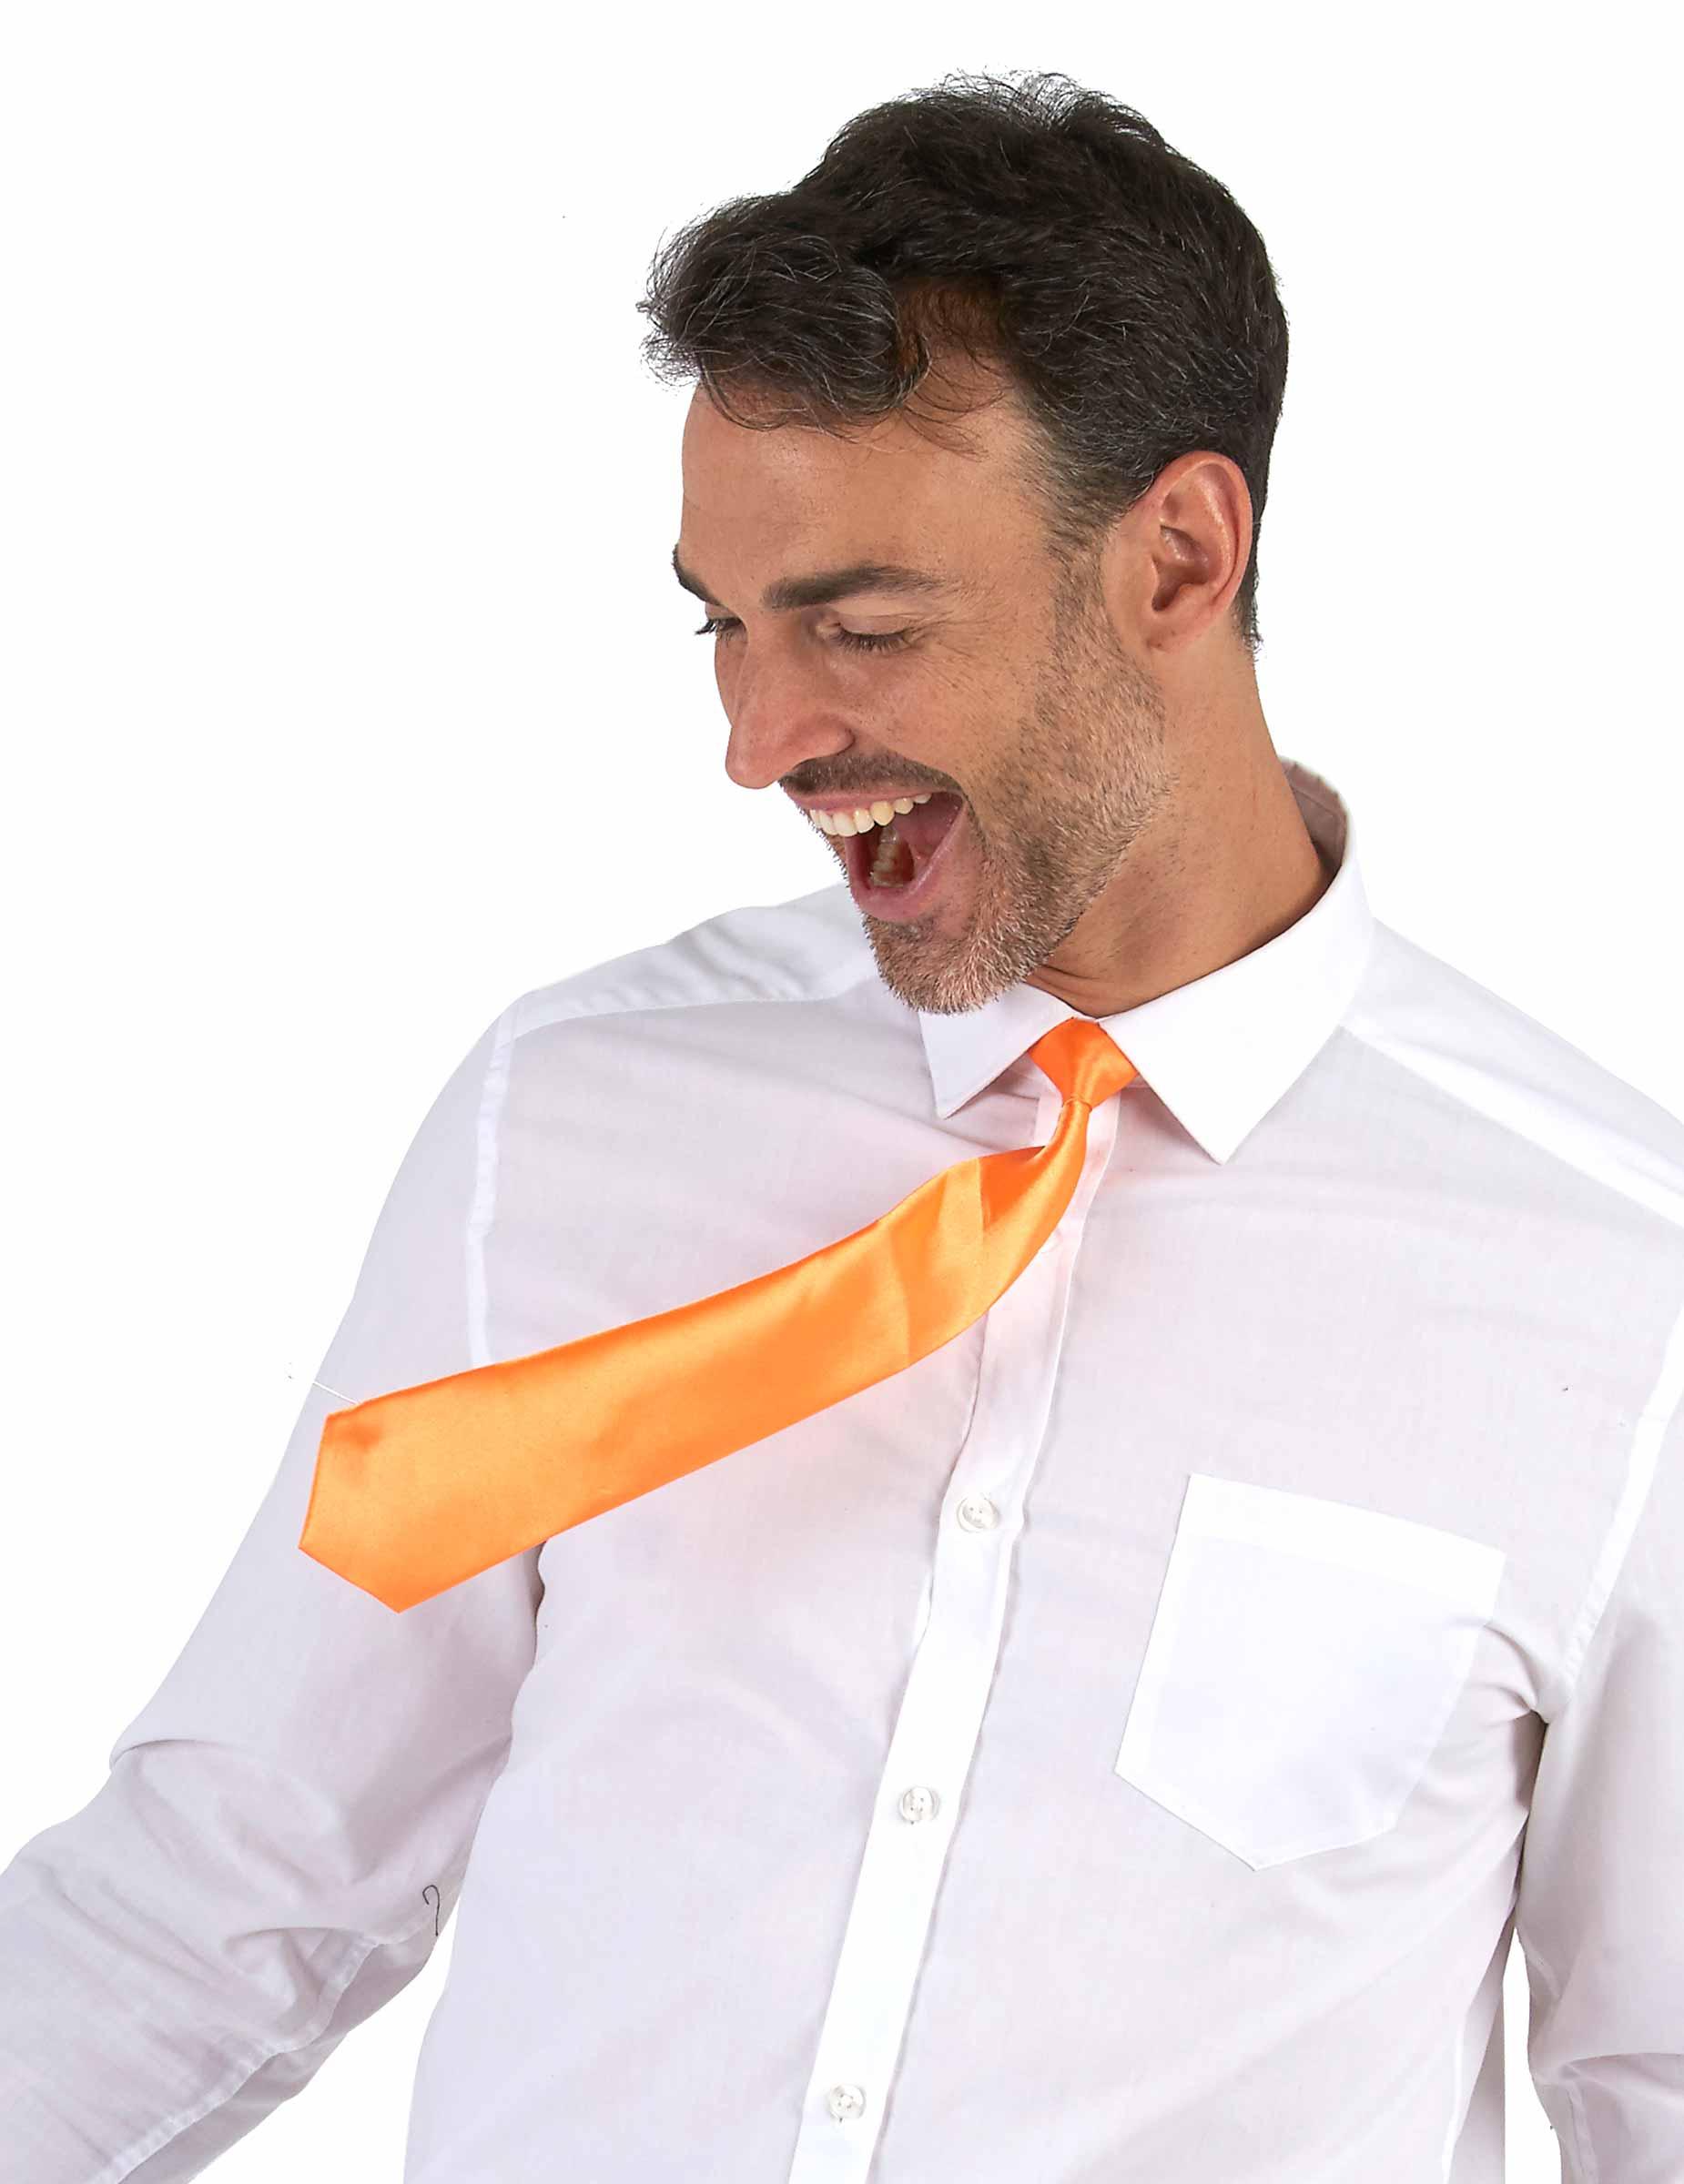 836d44a79 Corbata naranja fluorescente adulto